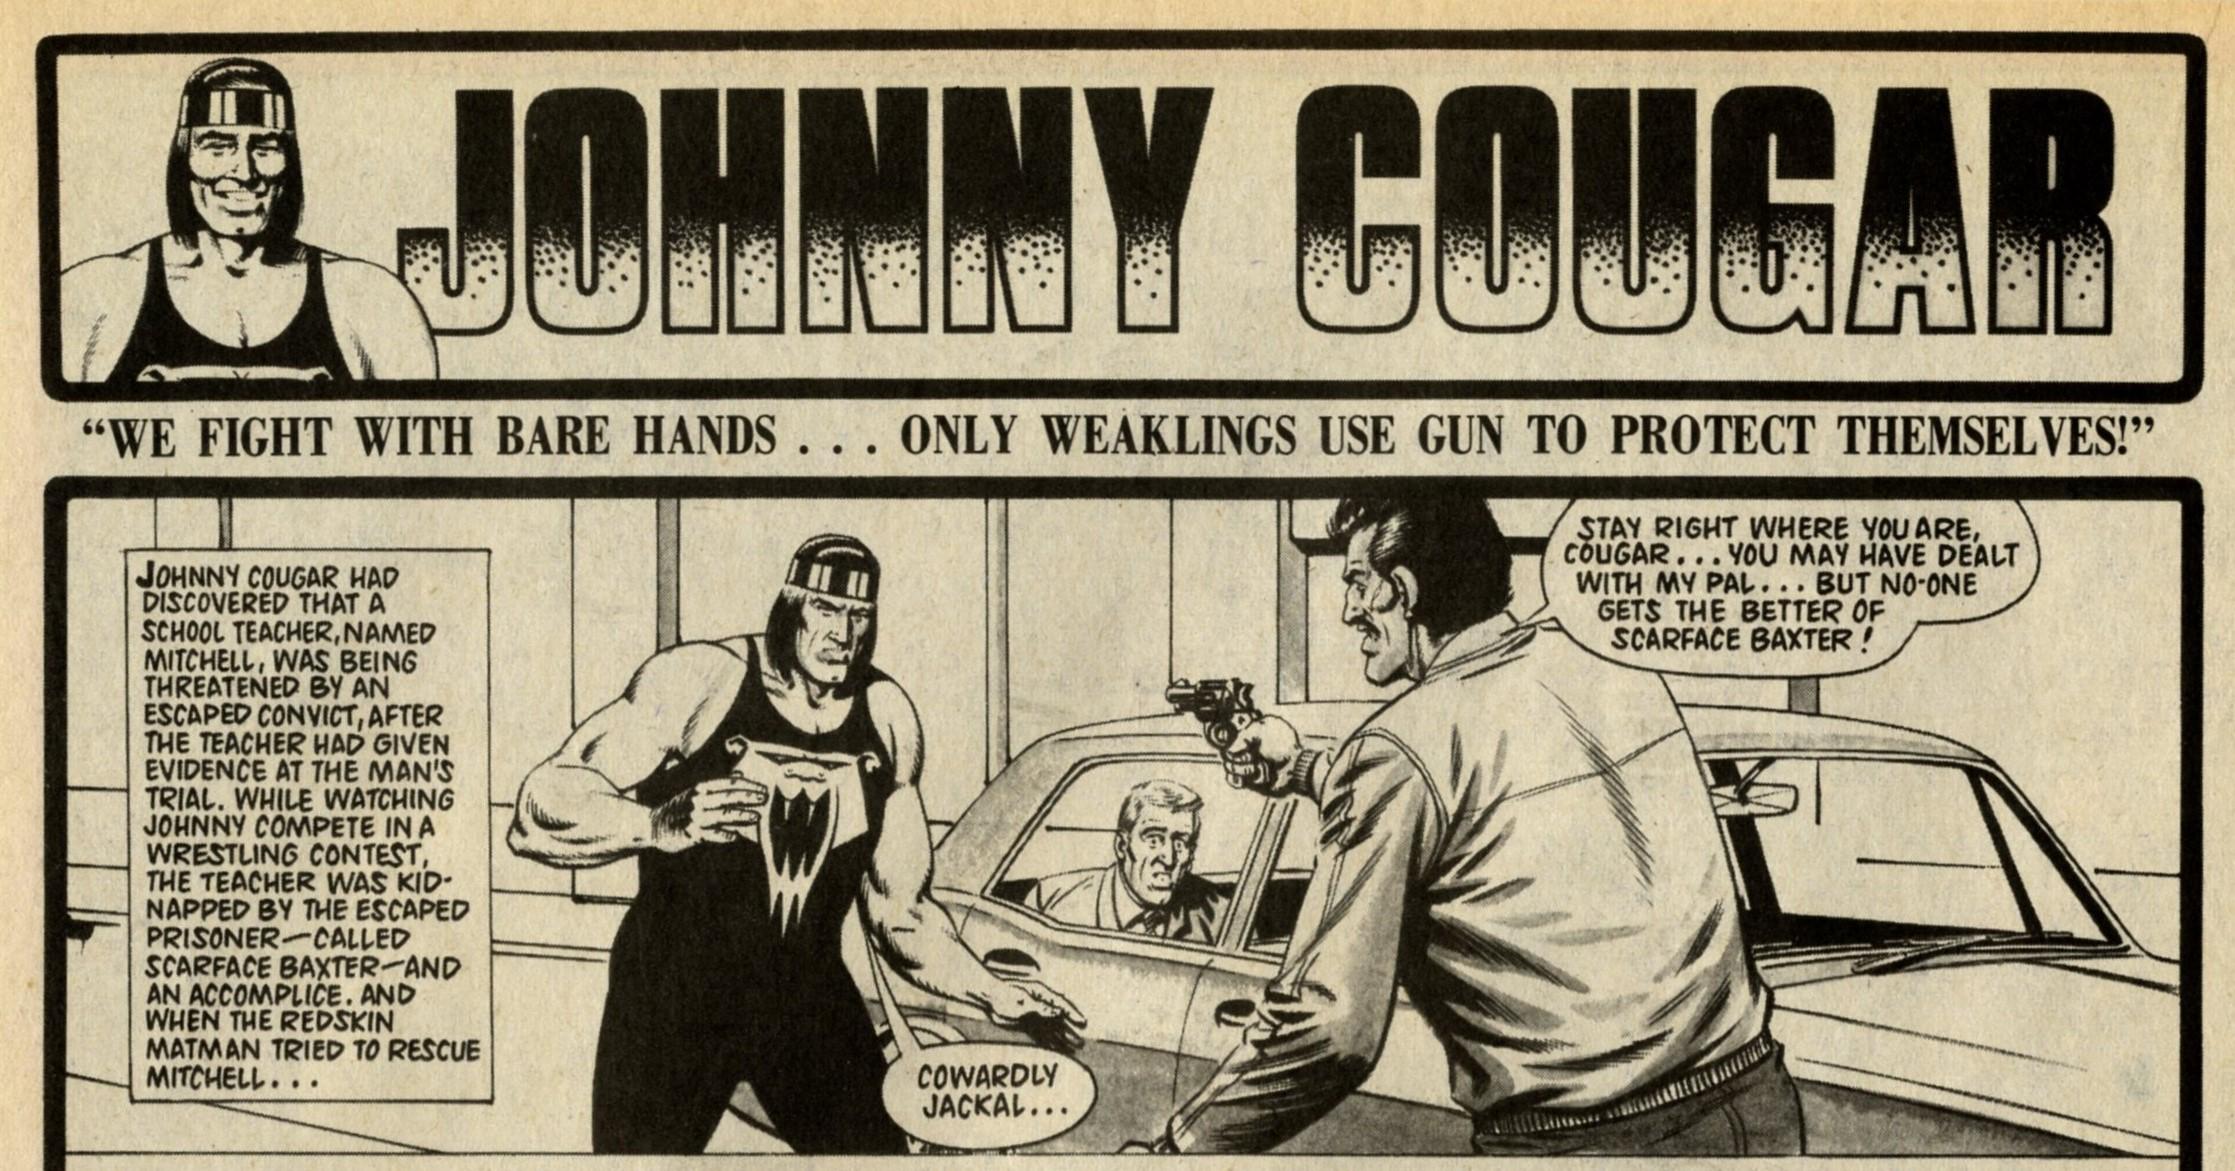 Johnny Cougar: Barrie Tomlinson (writer), Sandy James (artist)